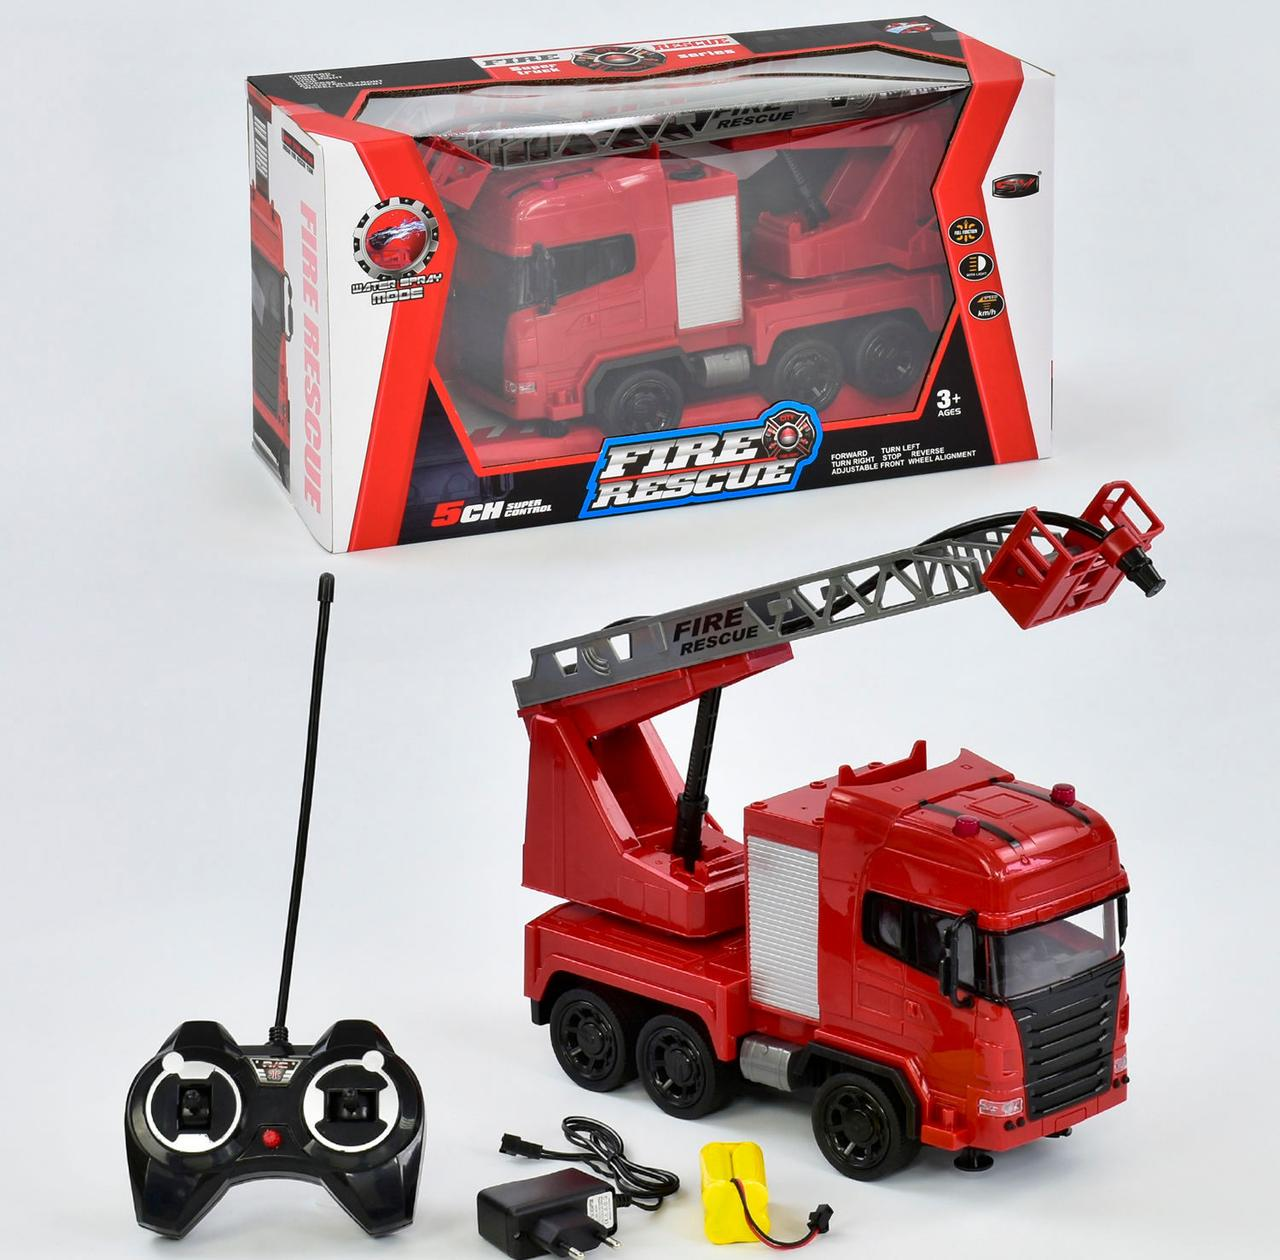 Машина пожарная на р/у 666-191 А аккумулятор 4.8V, брызгает водой, свет, звук,